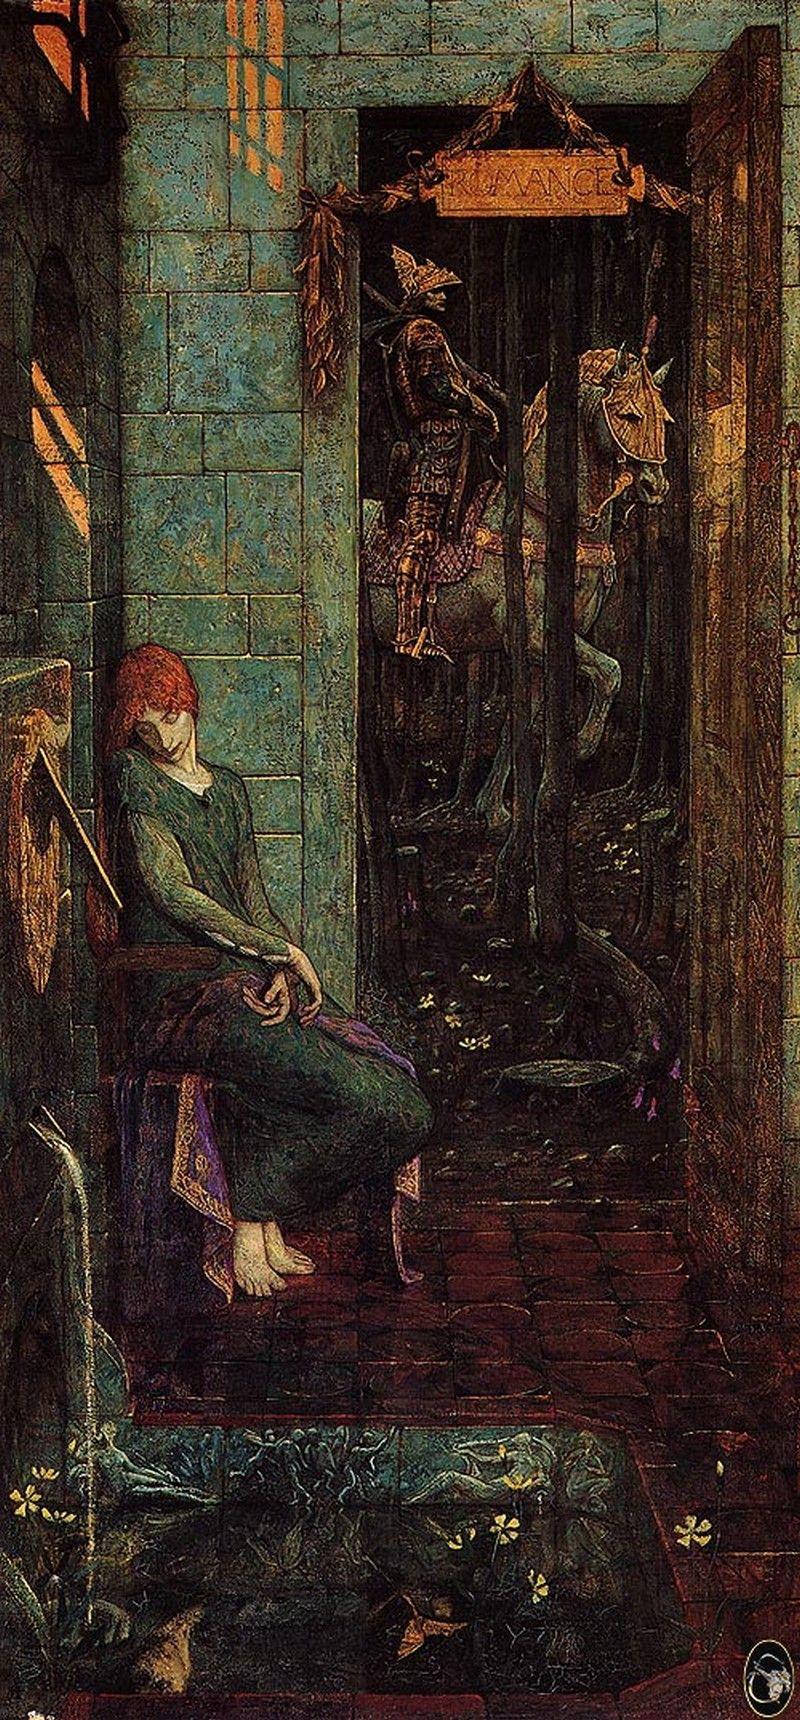 Edward Coley Burne-Jones. Owain leaves Landin